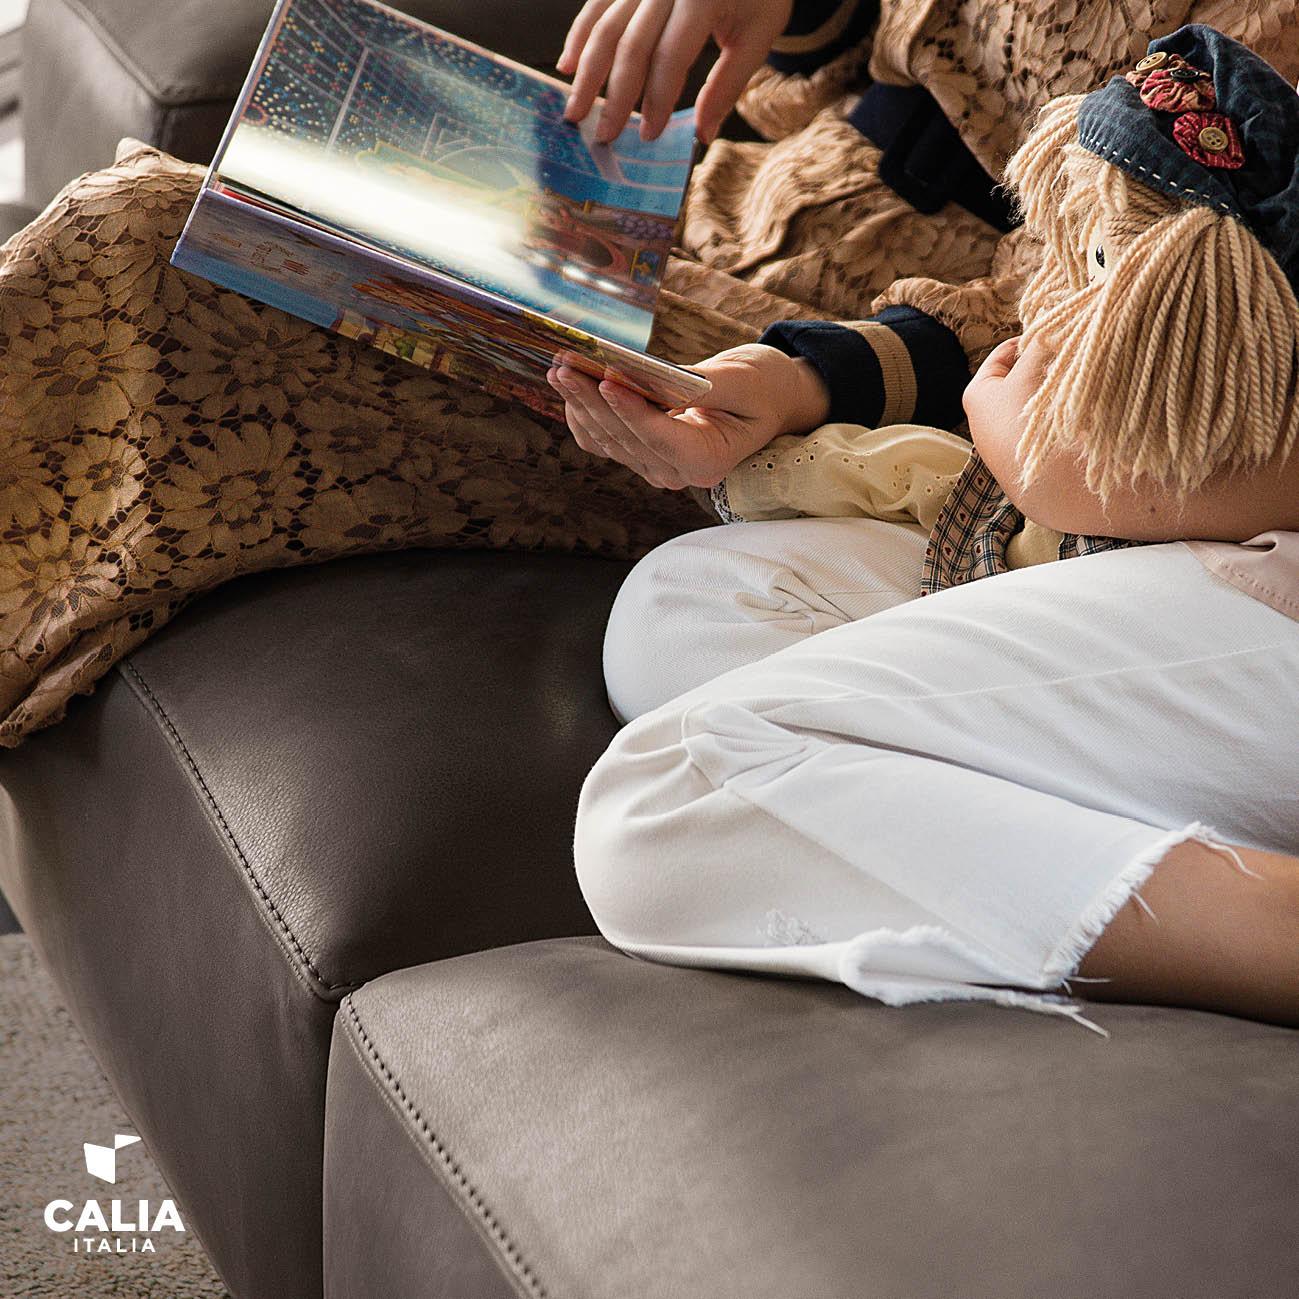 Caliaitalia - Foster